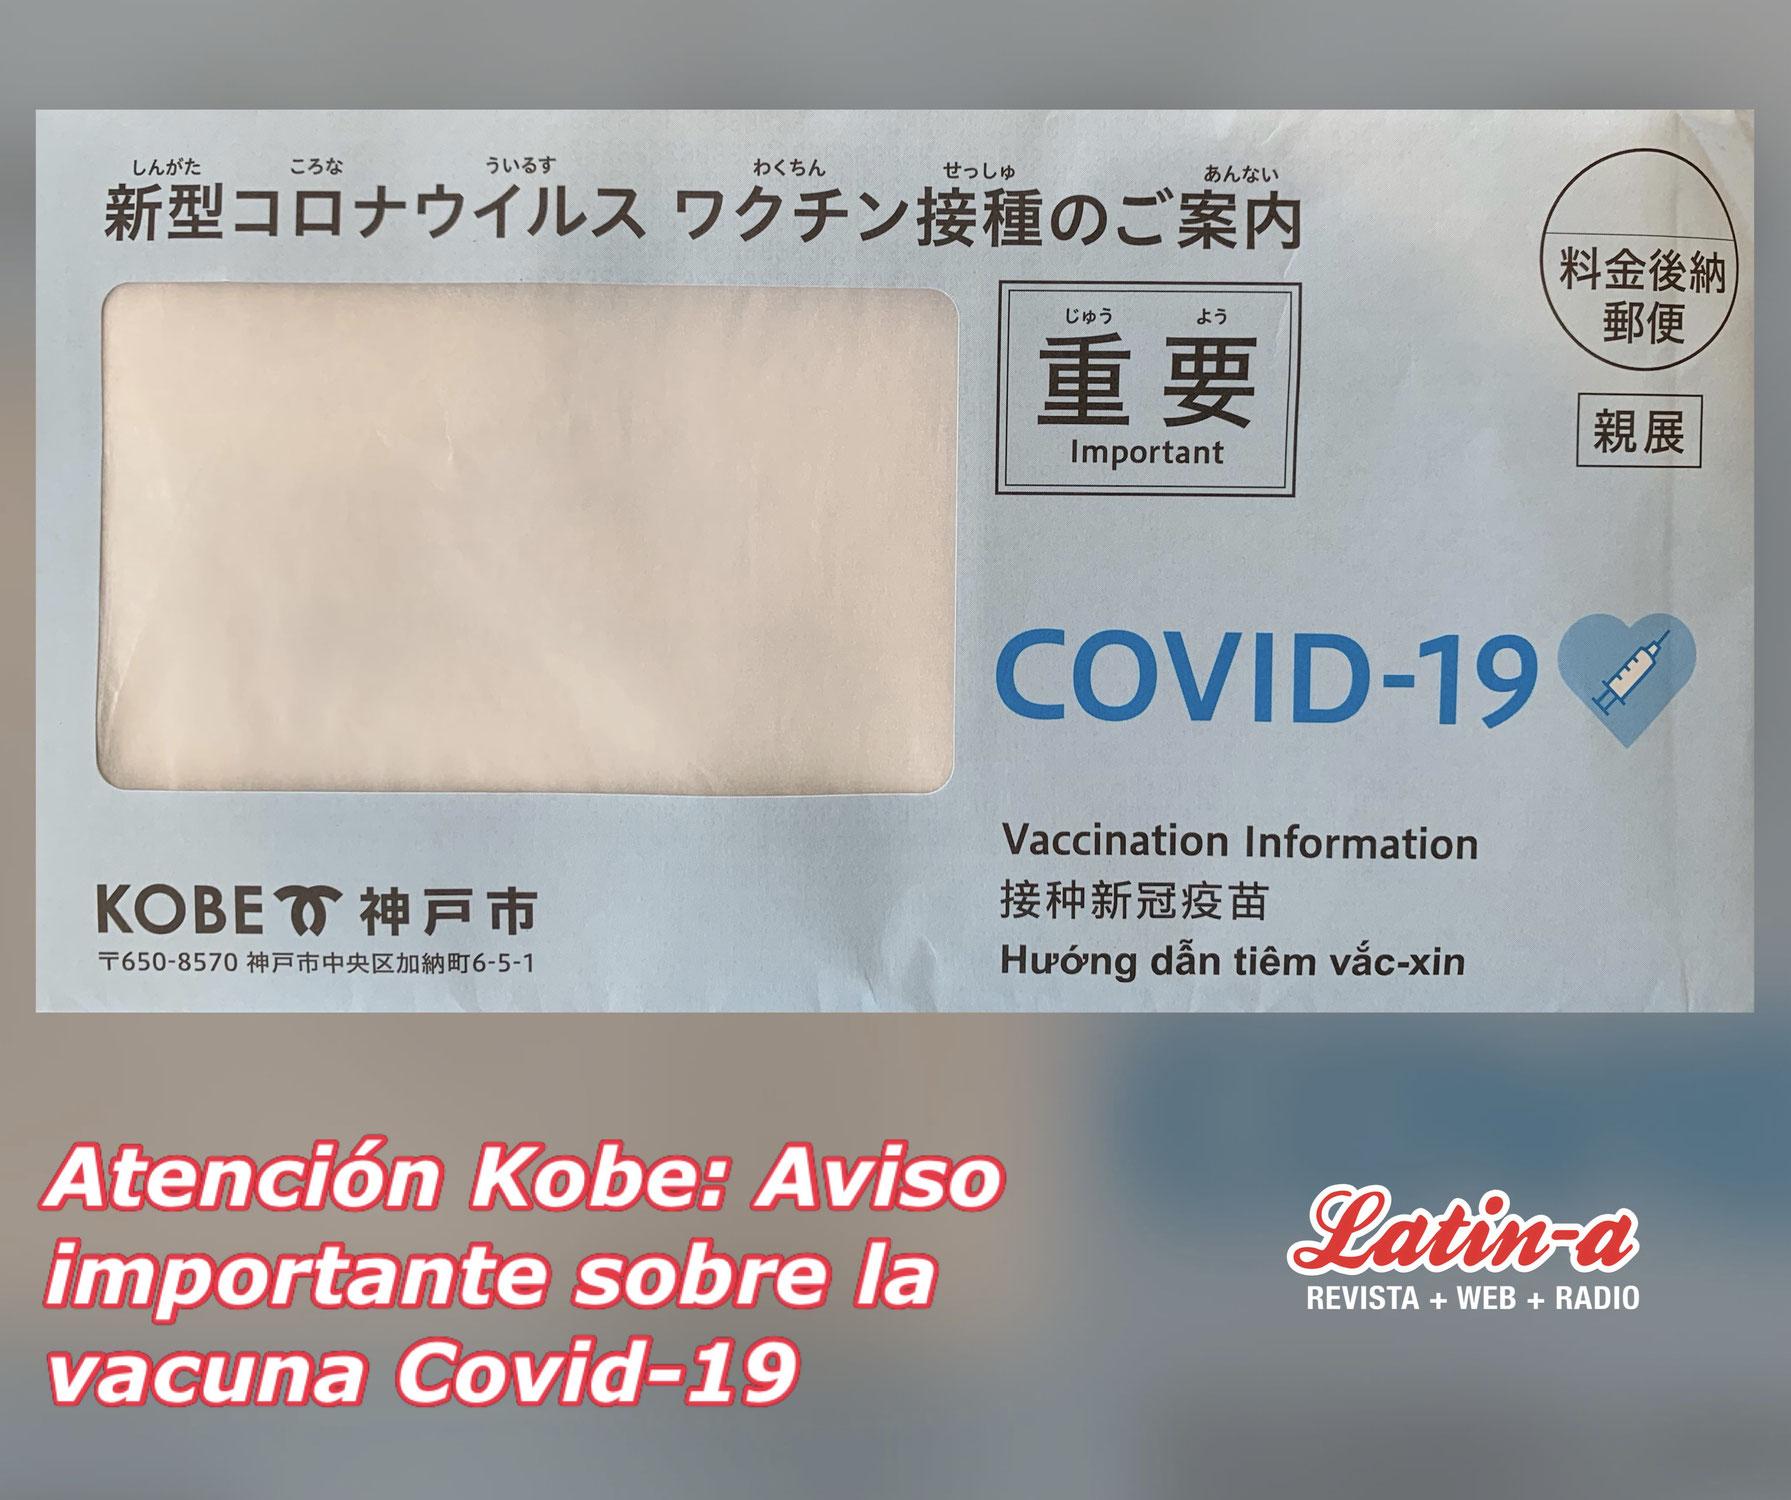 ◆◆Kobe: Aviso importante sobre la vacuna Covid-19◆◆